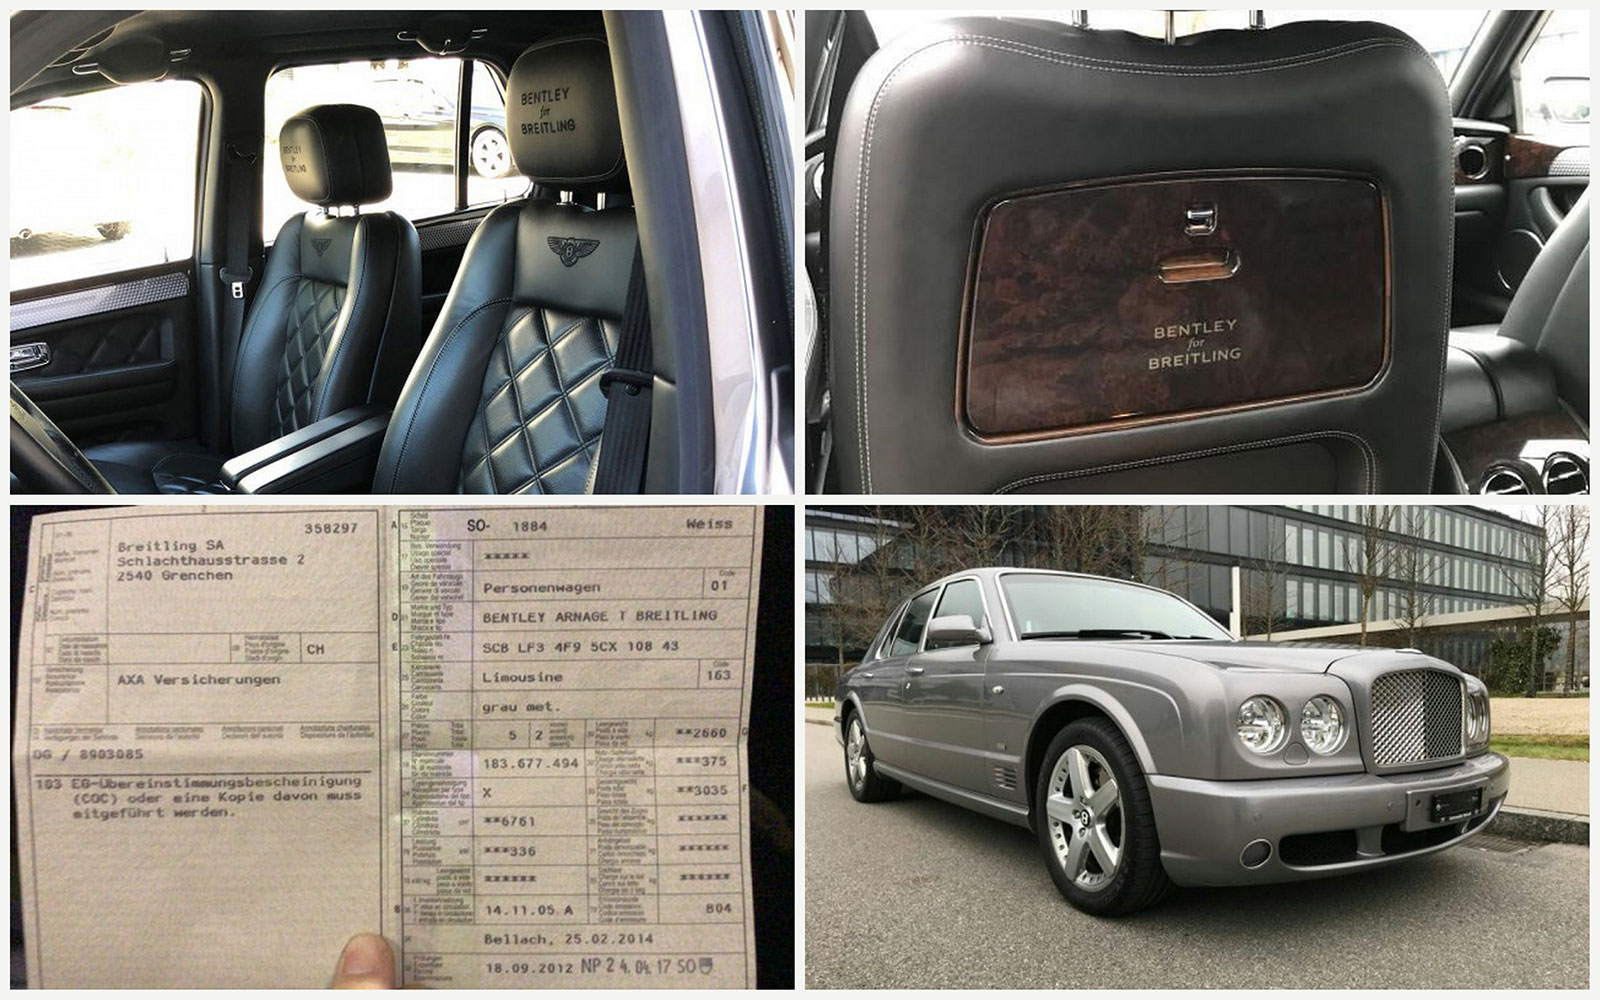 Breitling Bentley Arnage T car